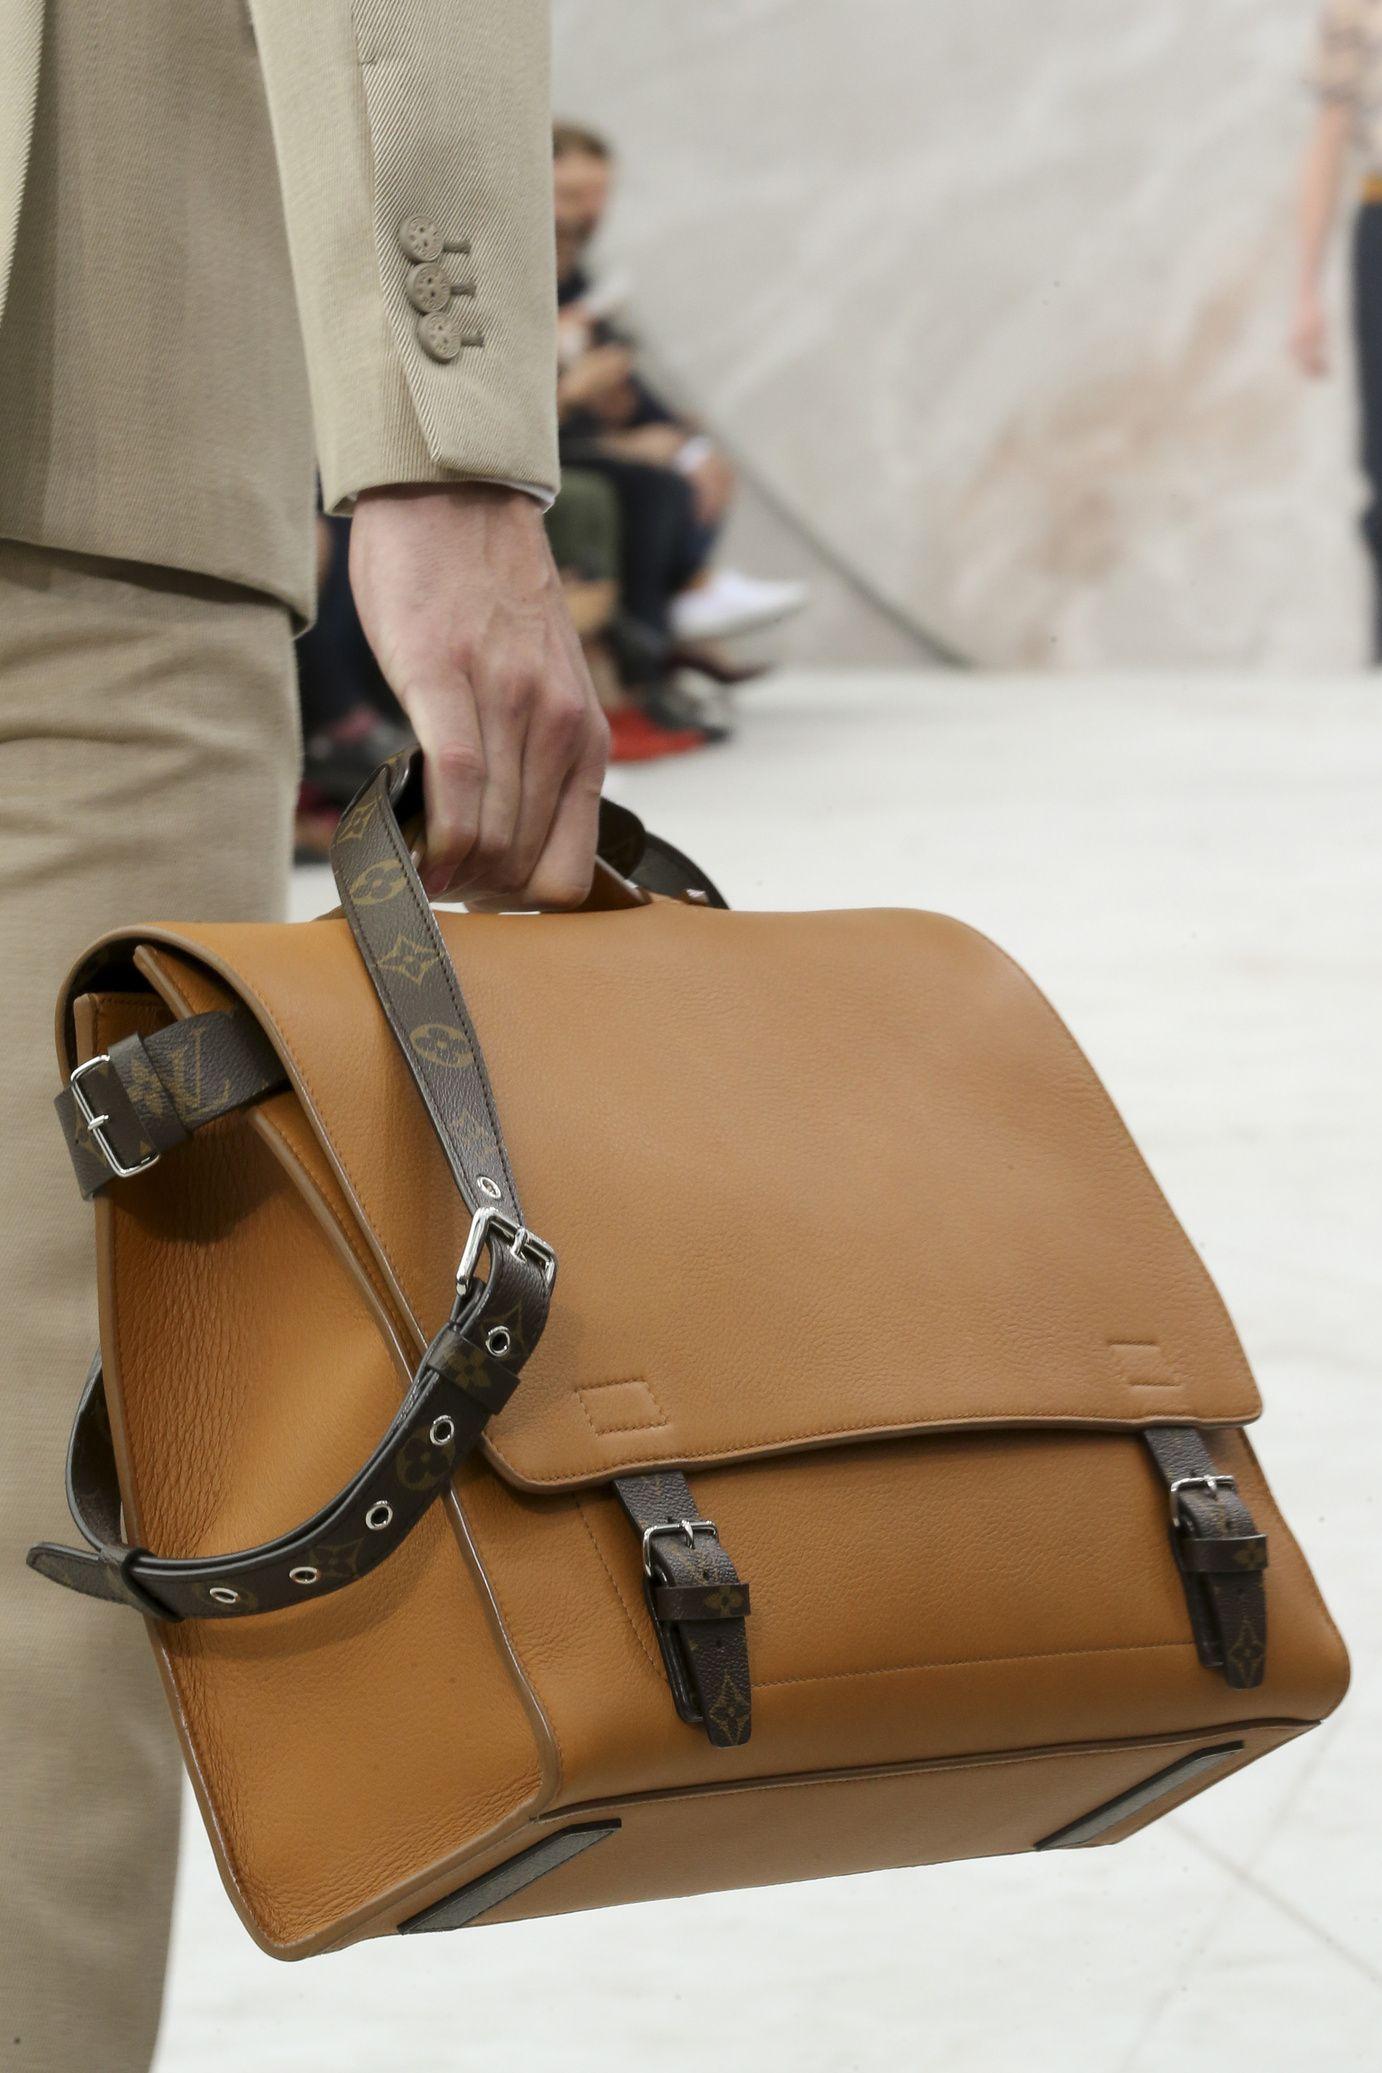 9c28900f73 McMola Retro Duffel Cylinder Bag Canvas Travel Backpack for Men Hiking  Luggage Weekend Bag